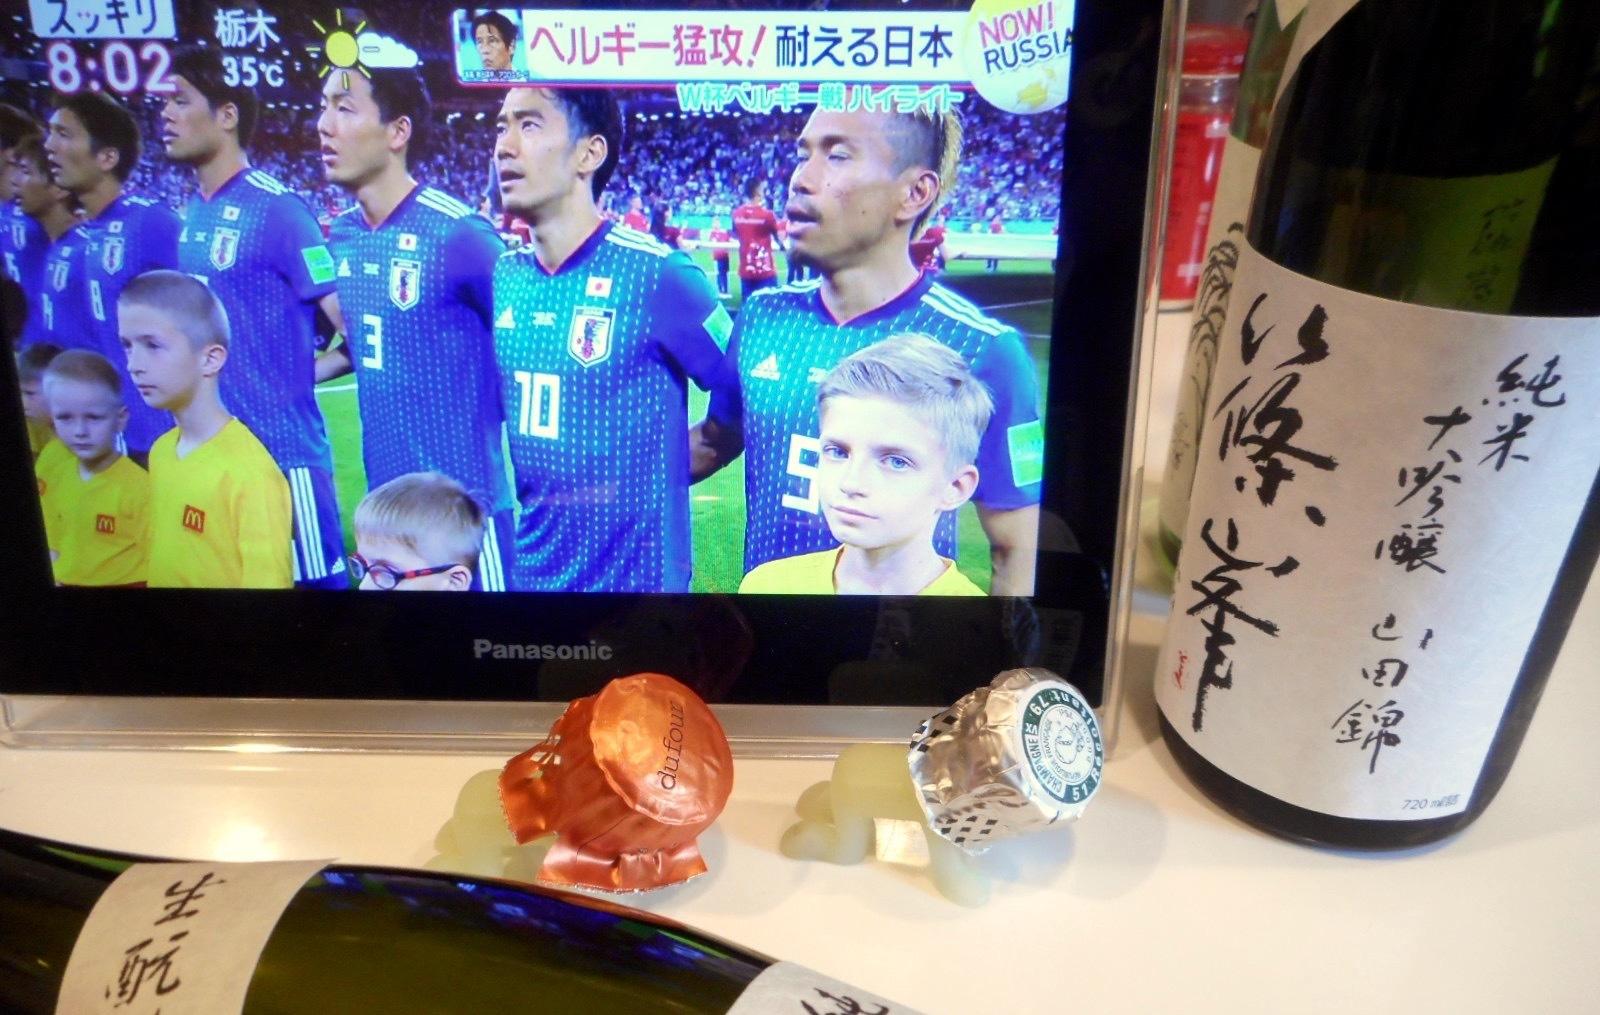 shinomine_kimoto_jundai29by1.jpg